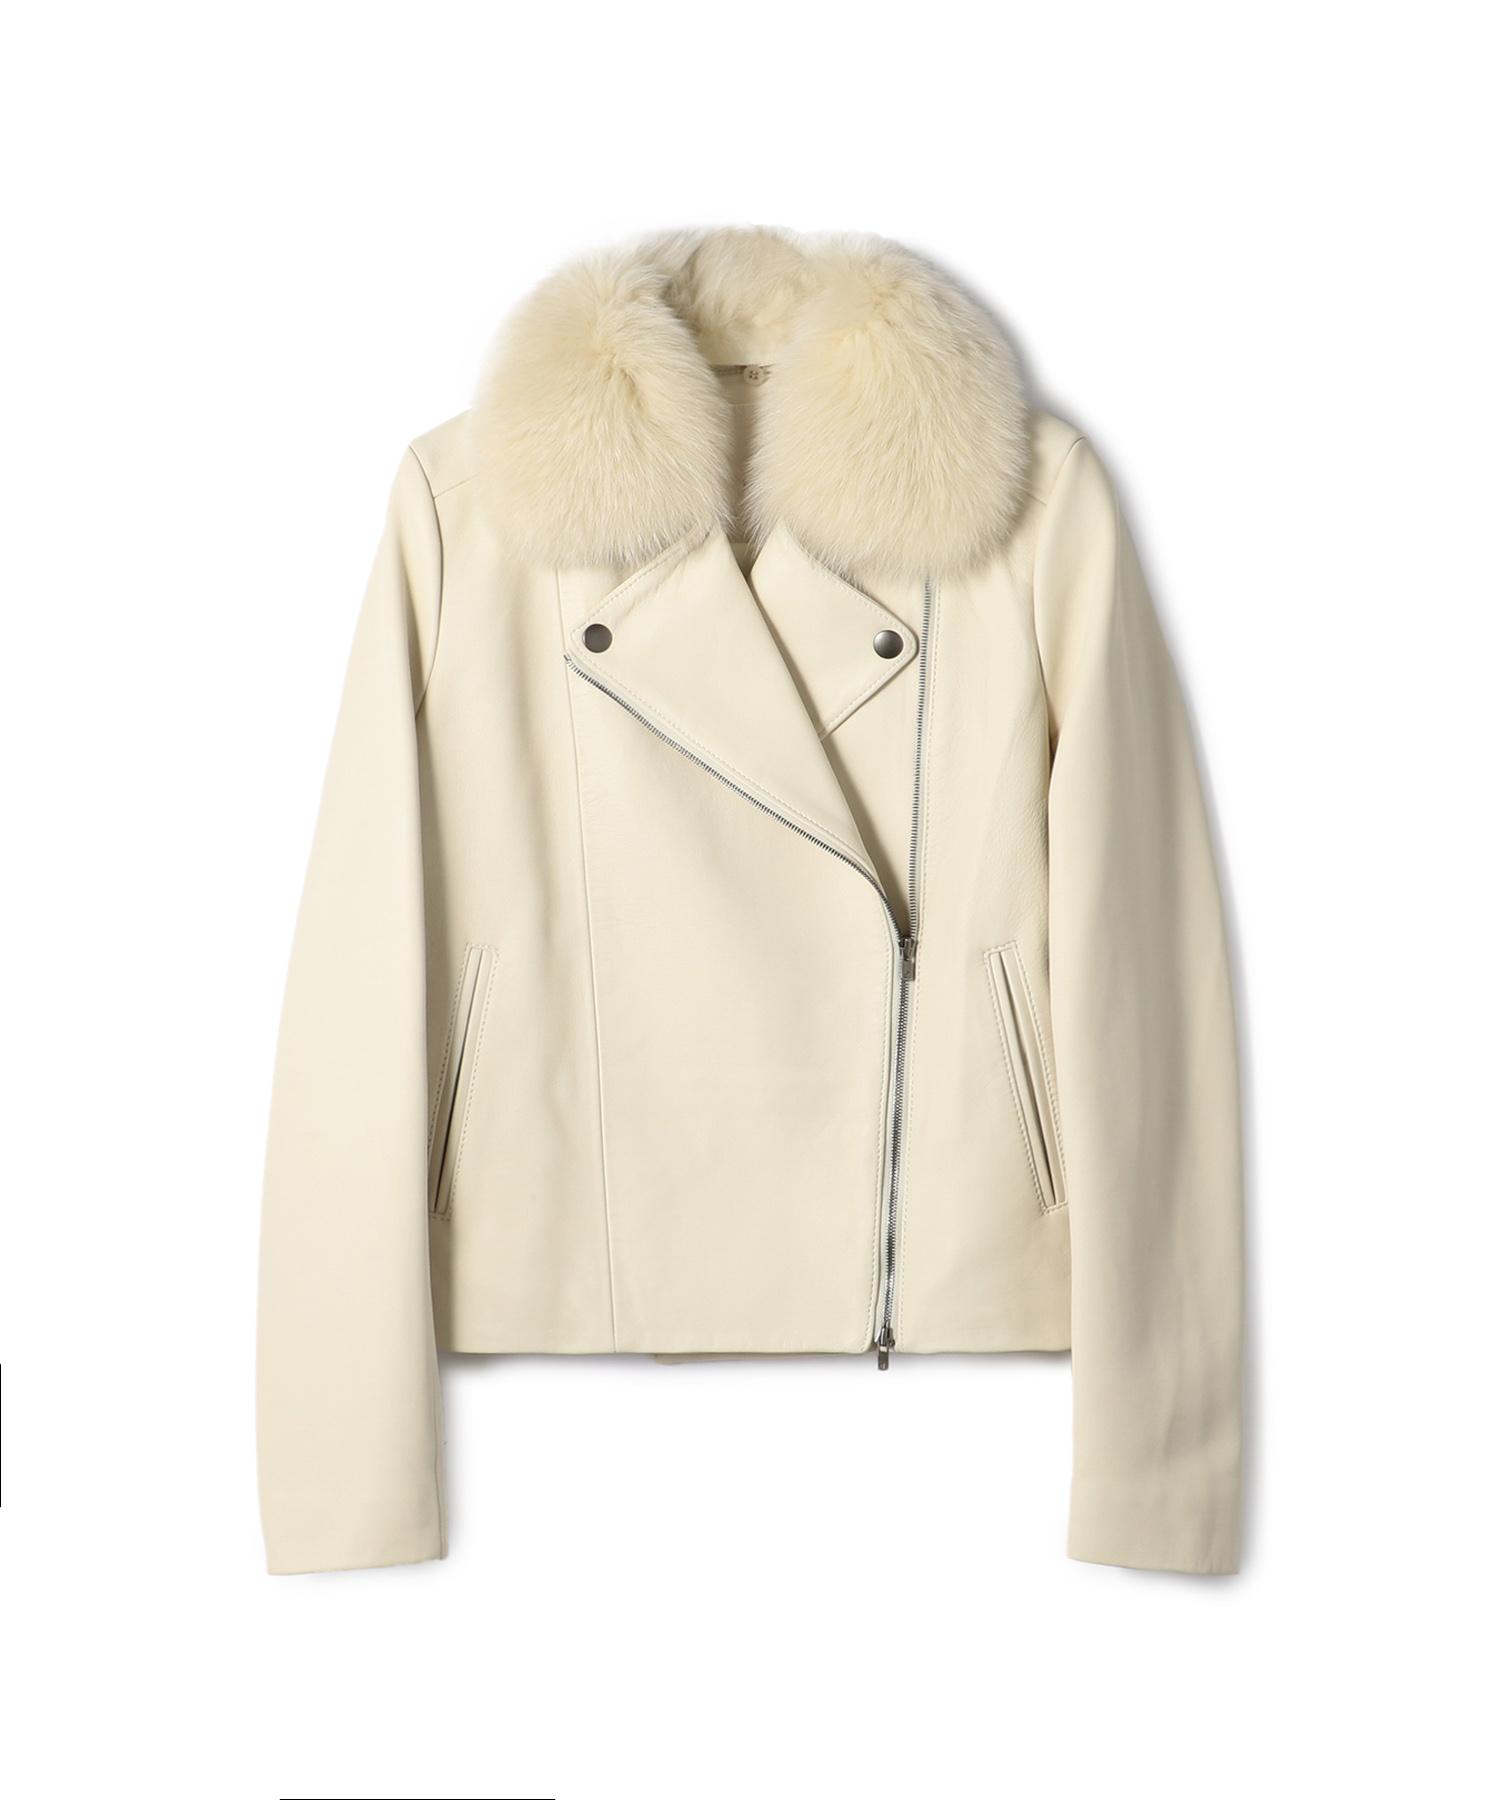 ESTNATION 衿ファー付きレザーライダースジャケット